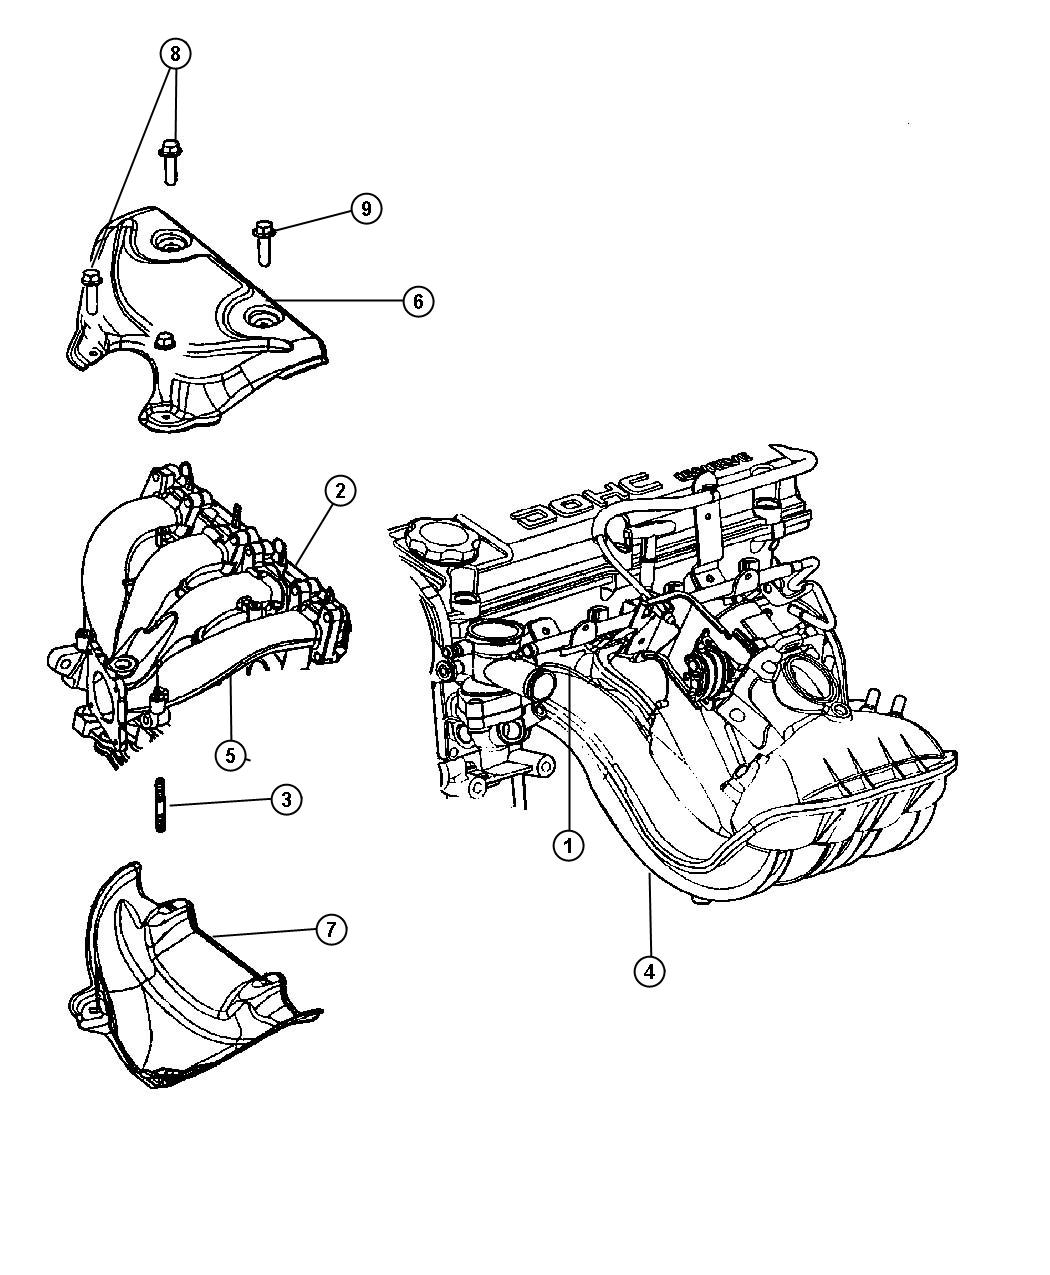 Dodge Stratus Gasket. Exhaust manifold. Exhaust manifold